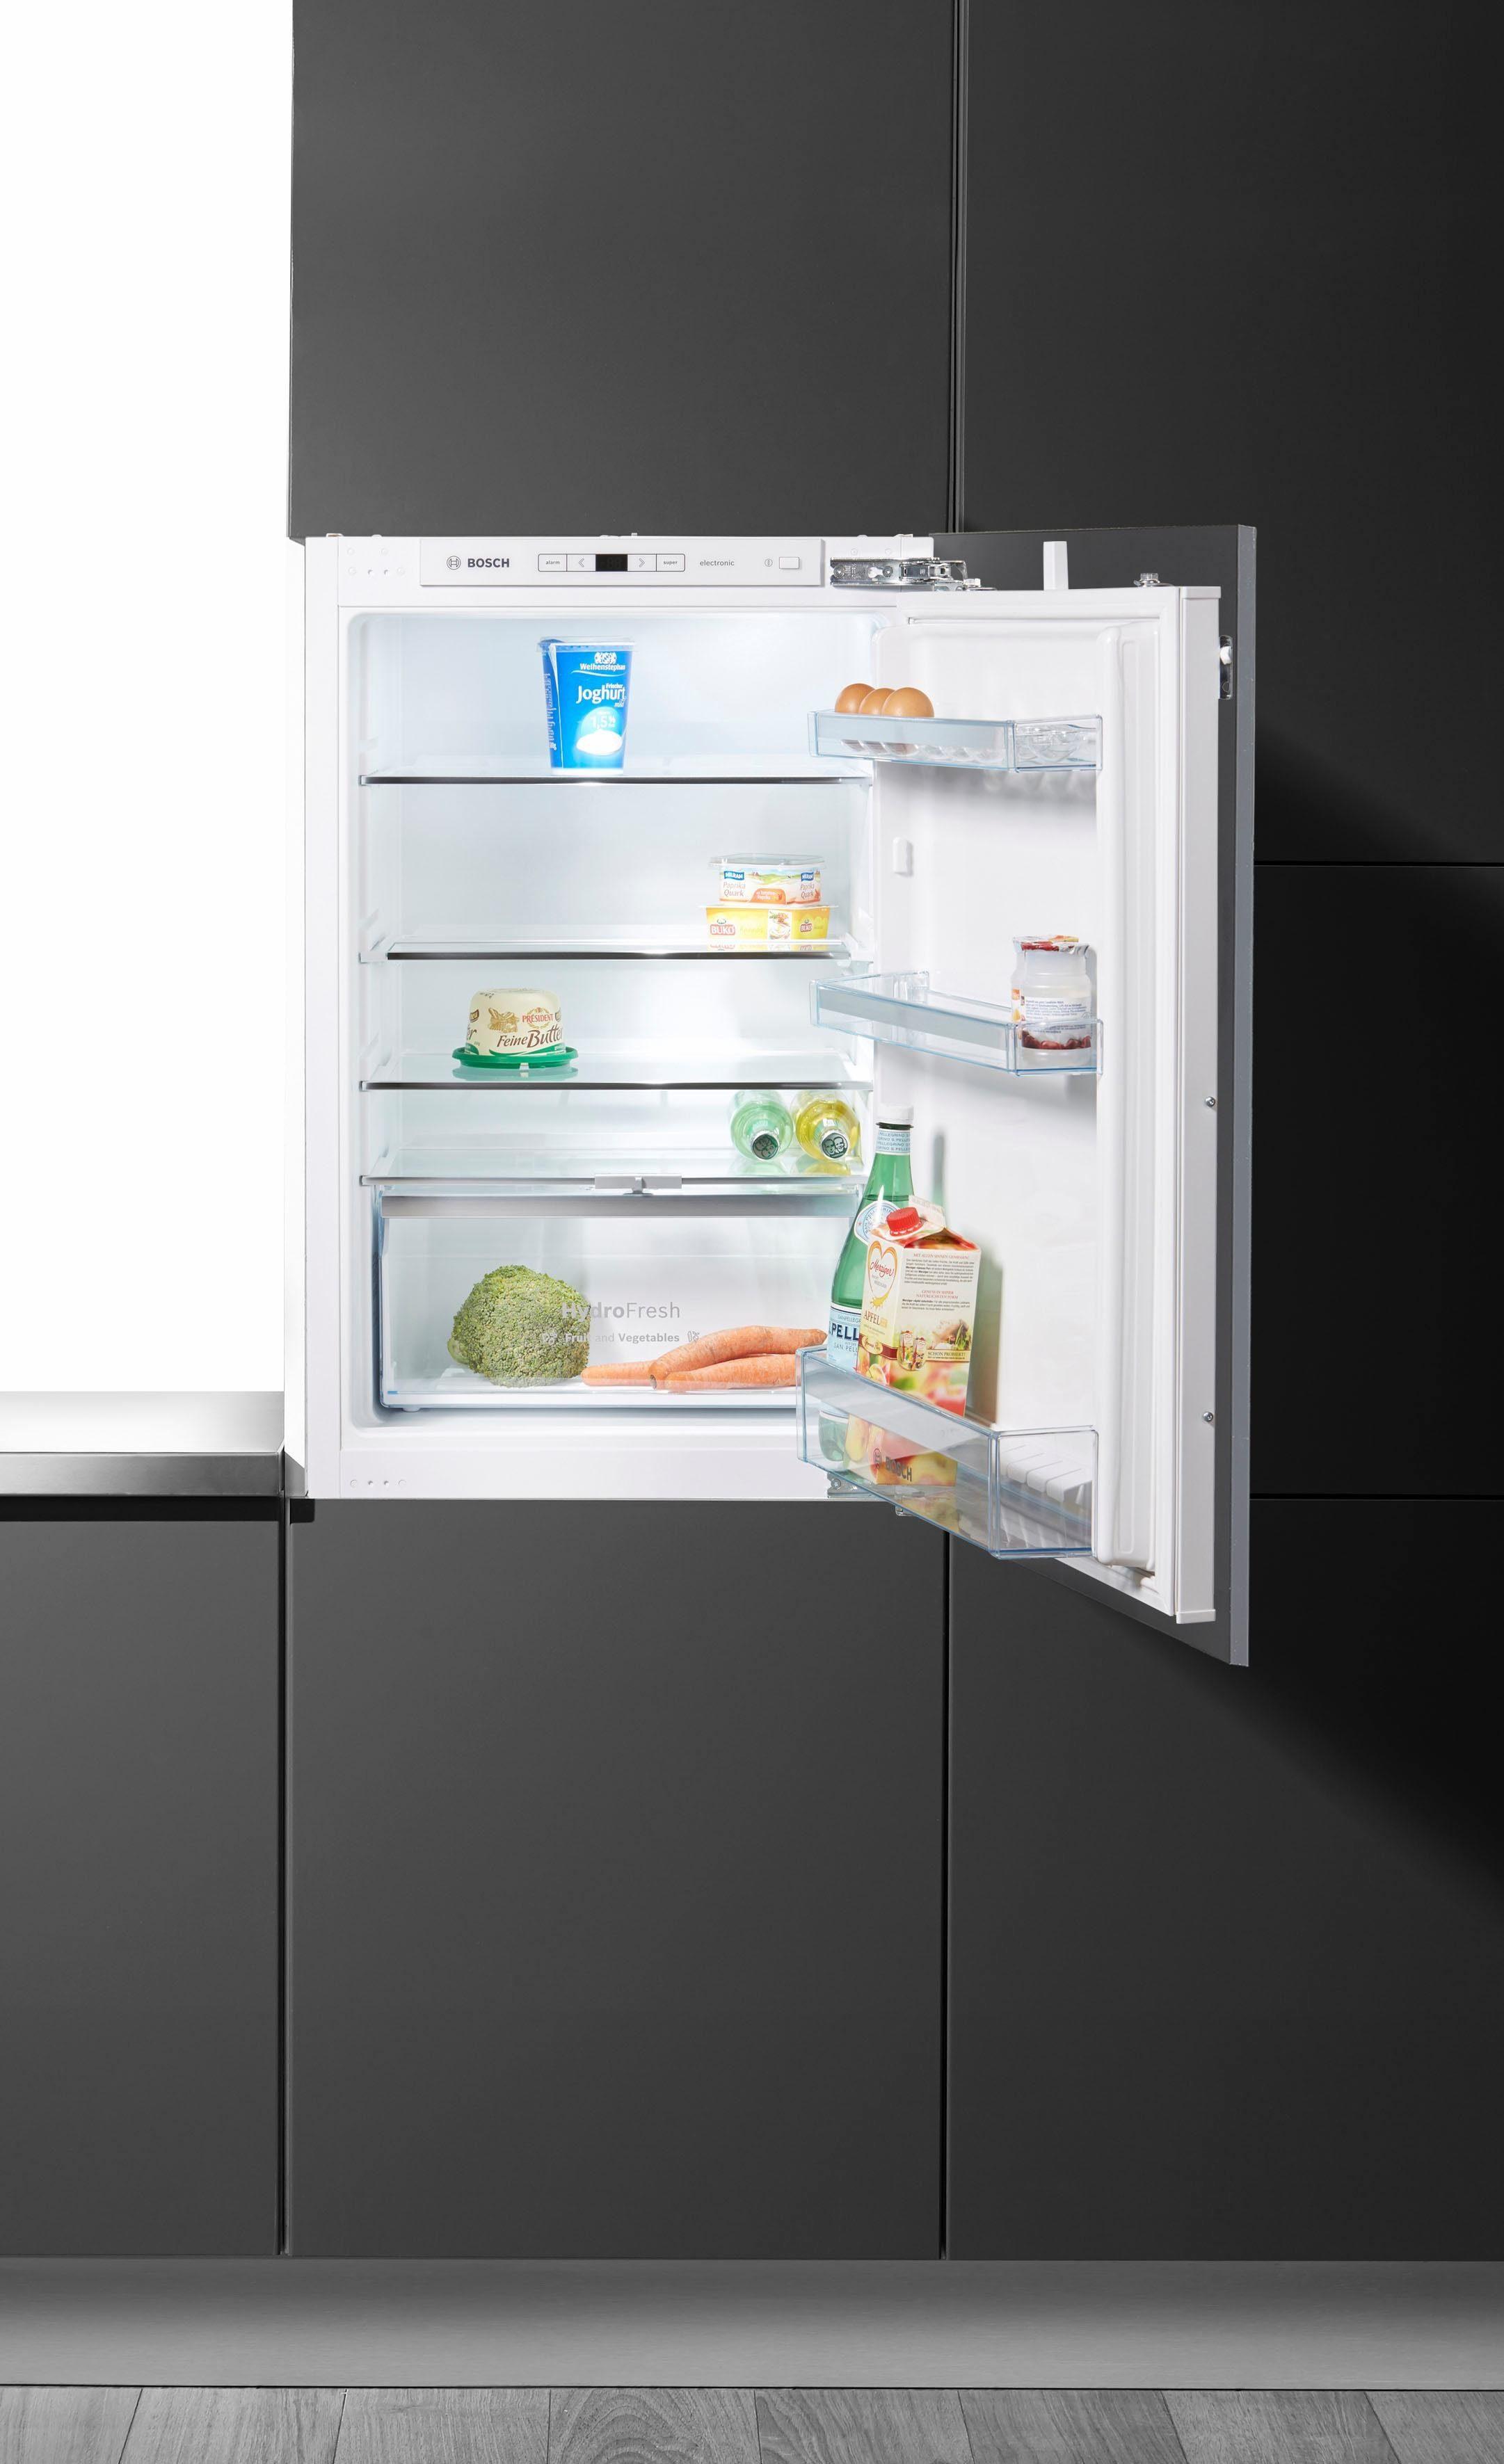 BOSCH Einbaukühlschrank KIR21AF40, 87,4 cm hoch, 55,8 cm breit, A+++, 87,4 cm